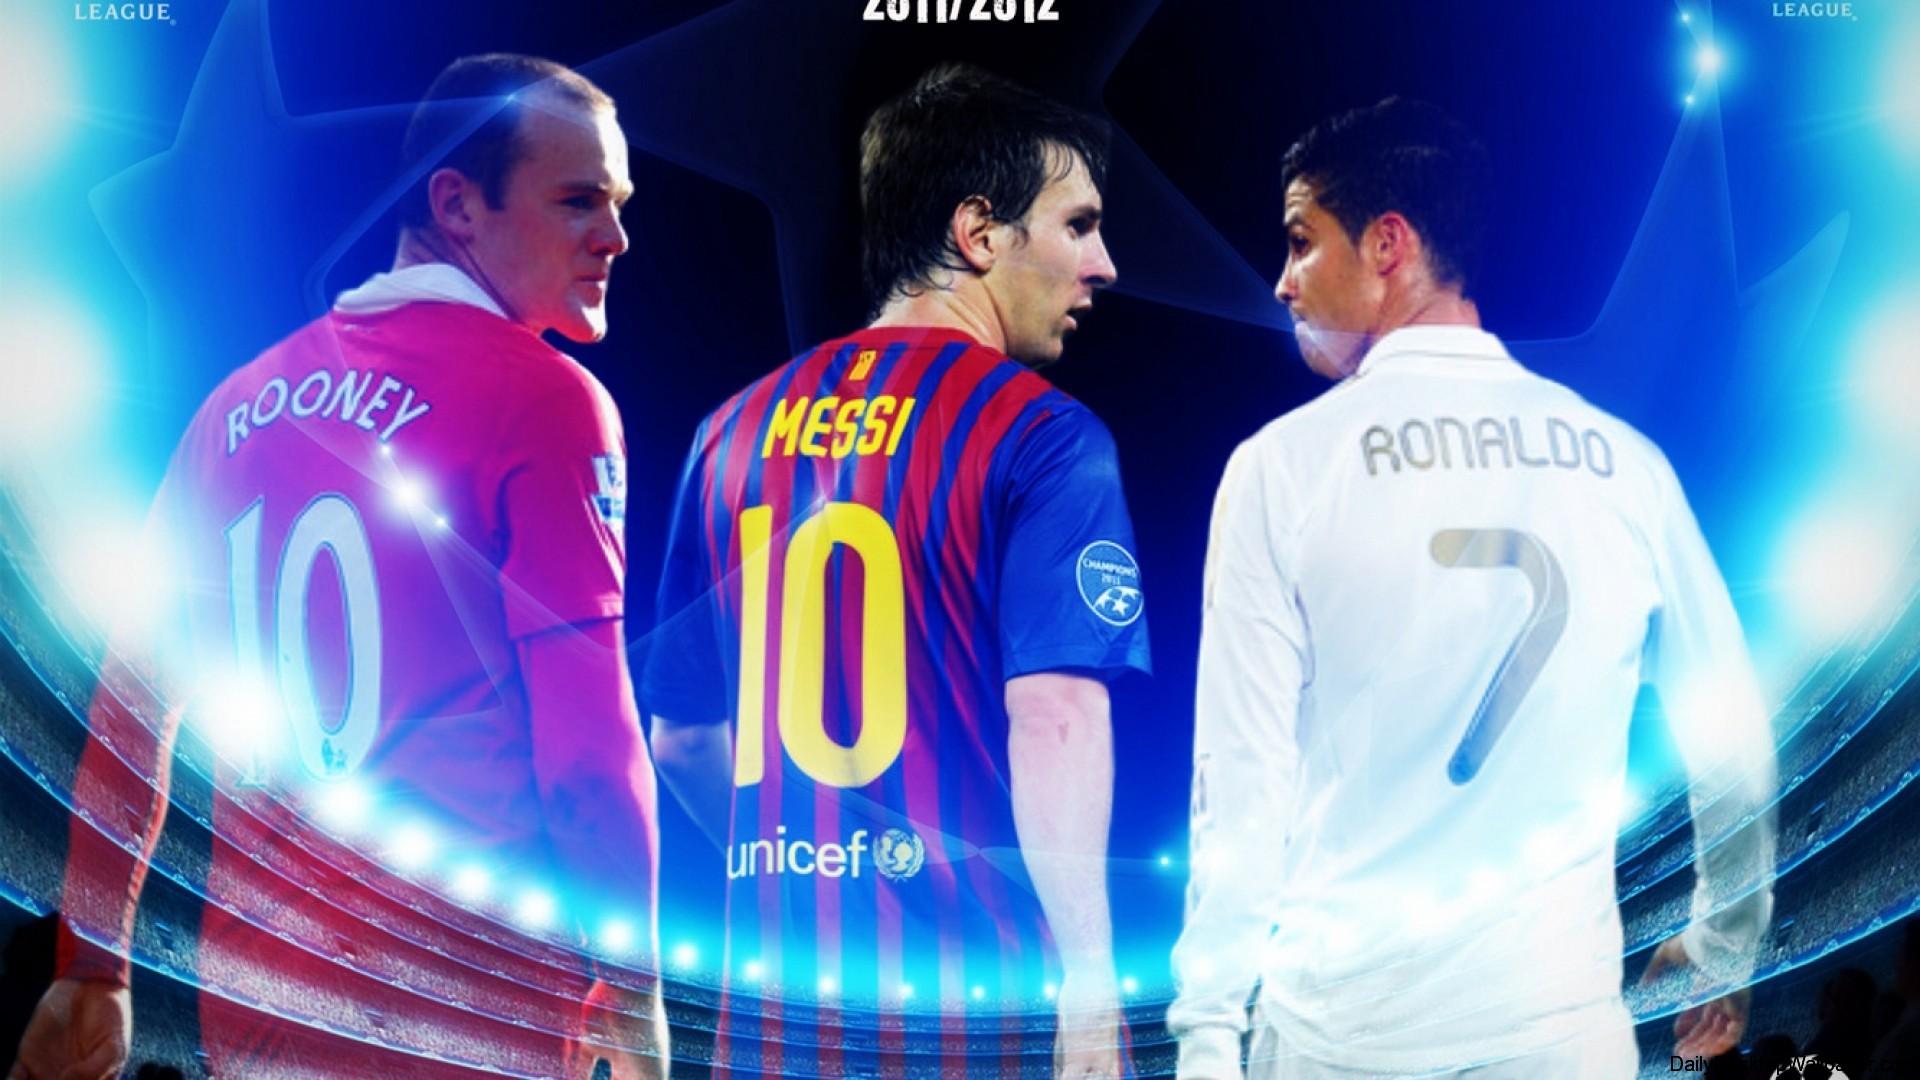 Champions League 2011 2012 Wallpaper wallpaper   964658 1920x1080